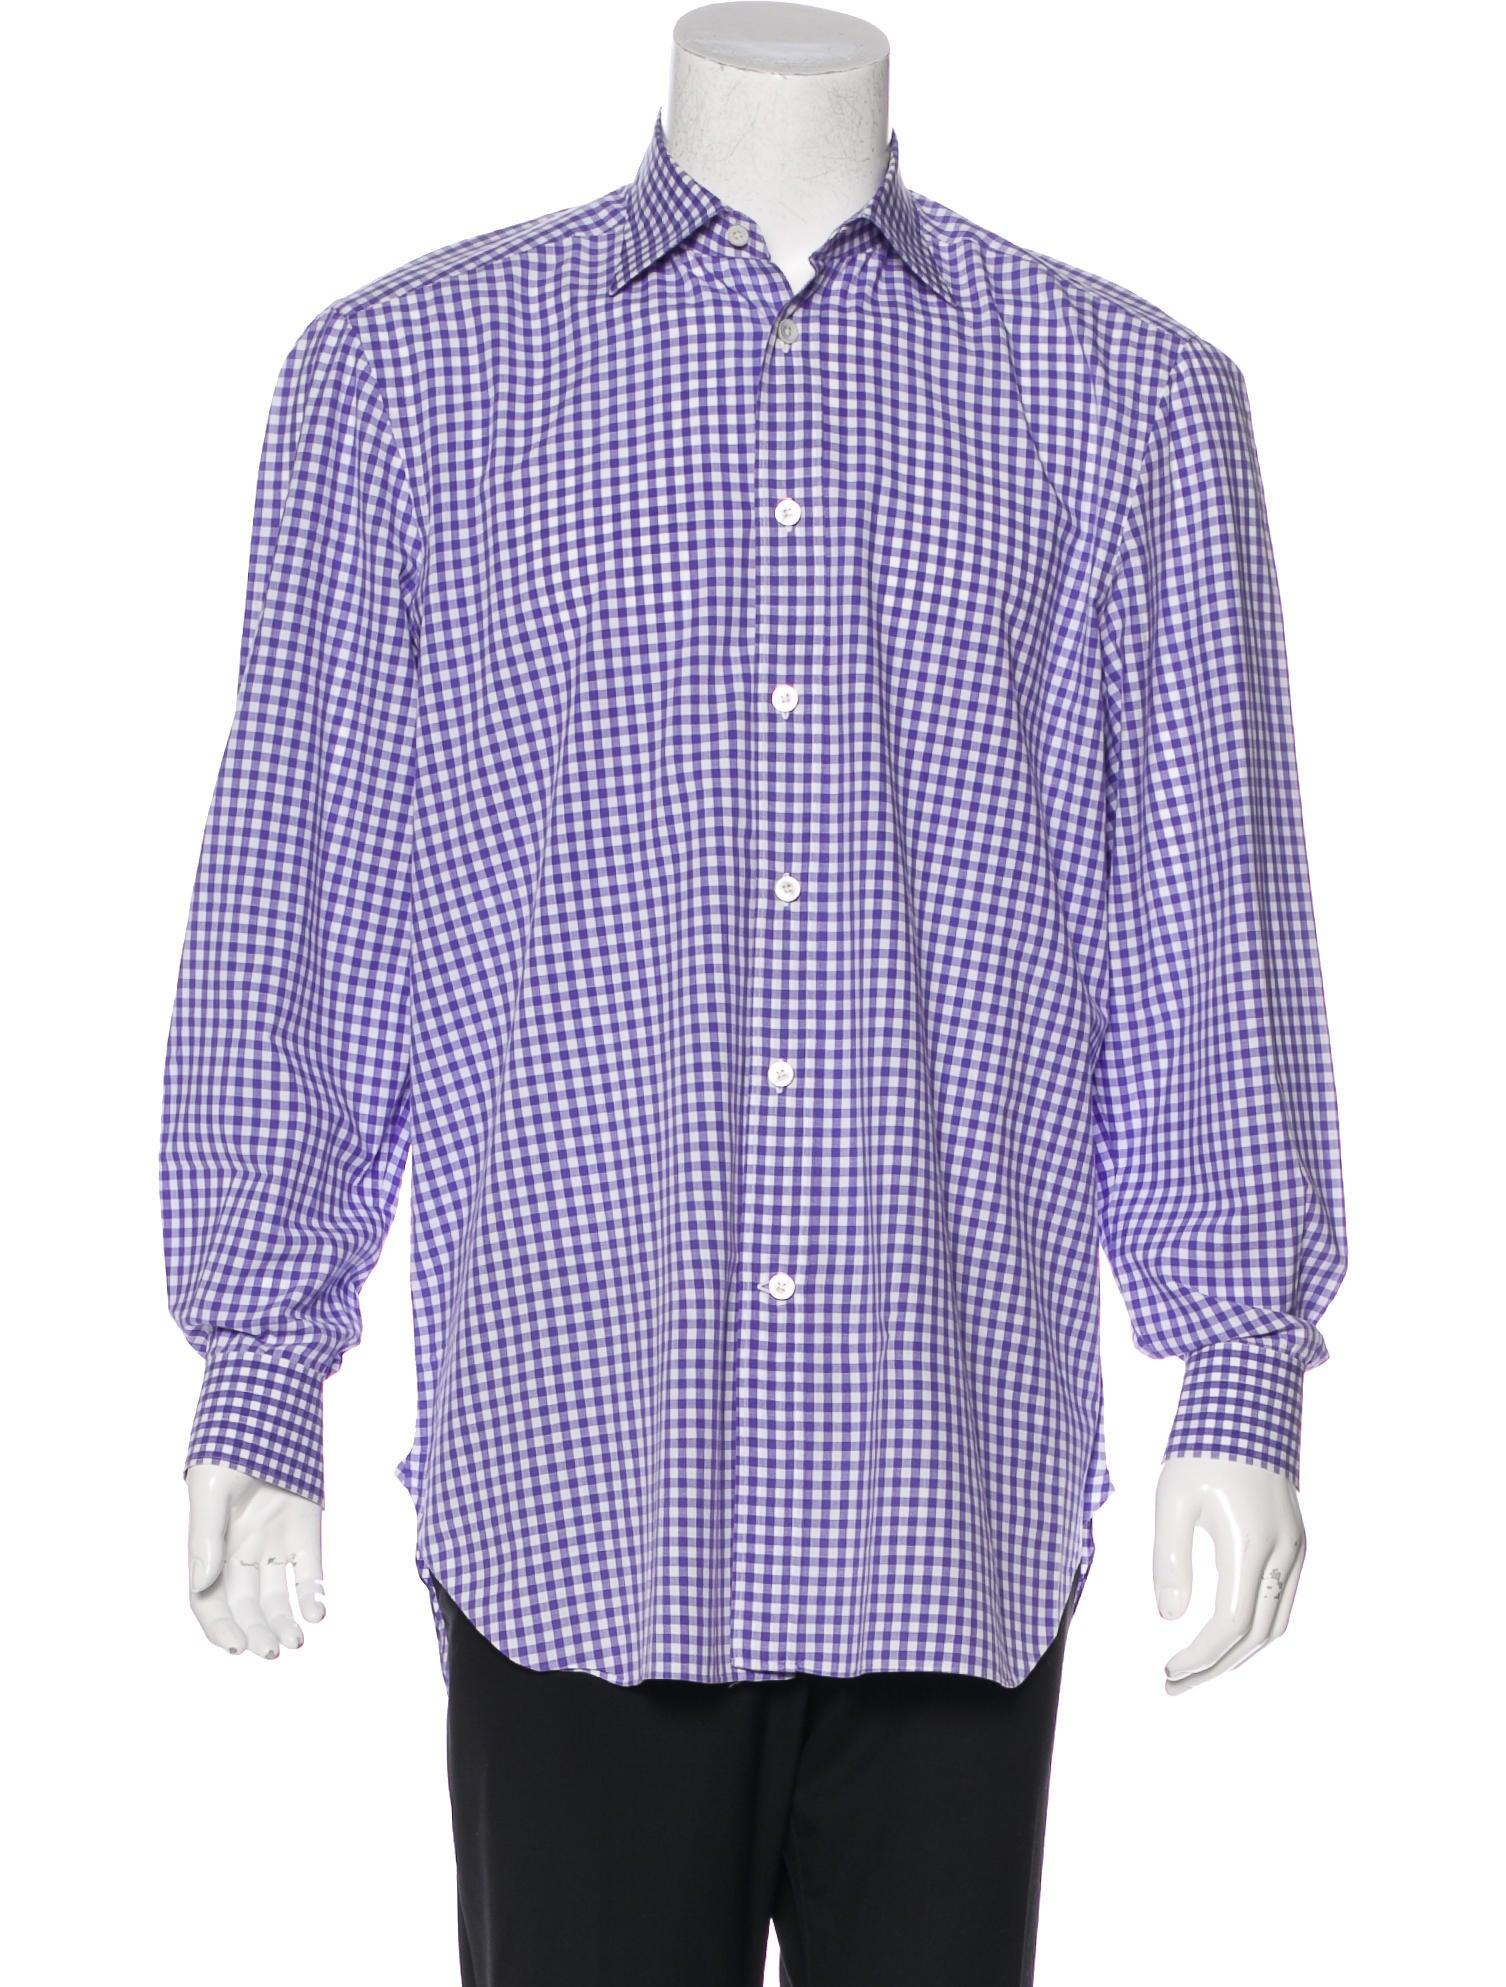 Kiton gingham dress shirt clothing kit21803 the realreal for Men s red gingham dress shirt